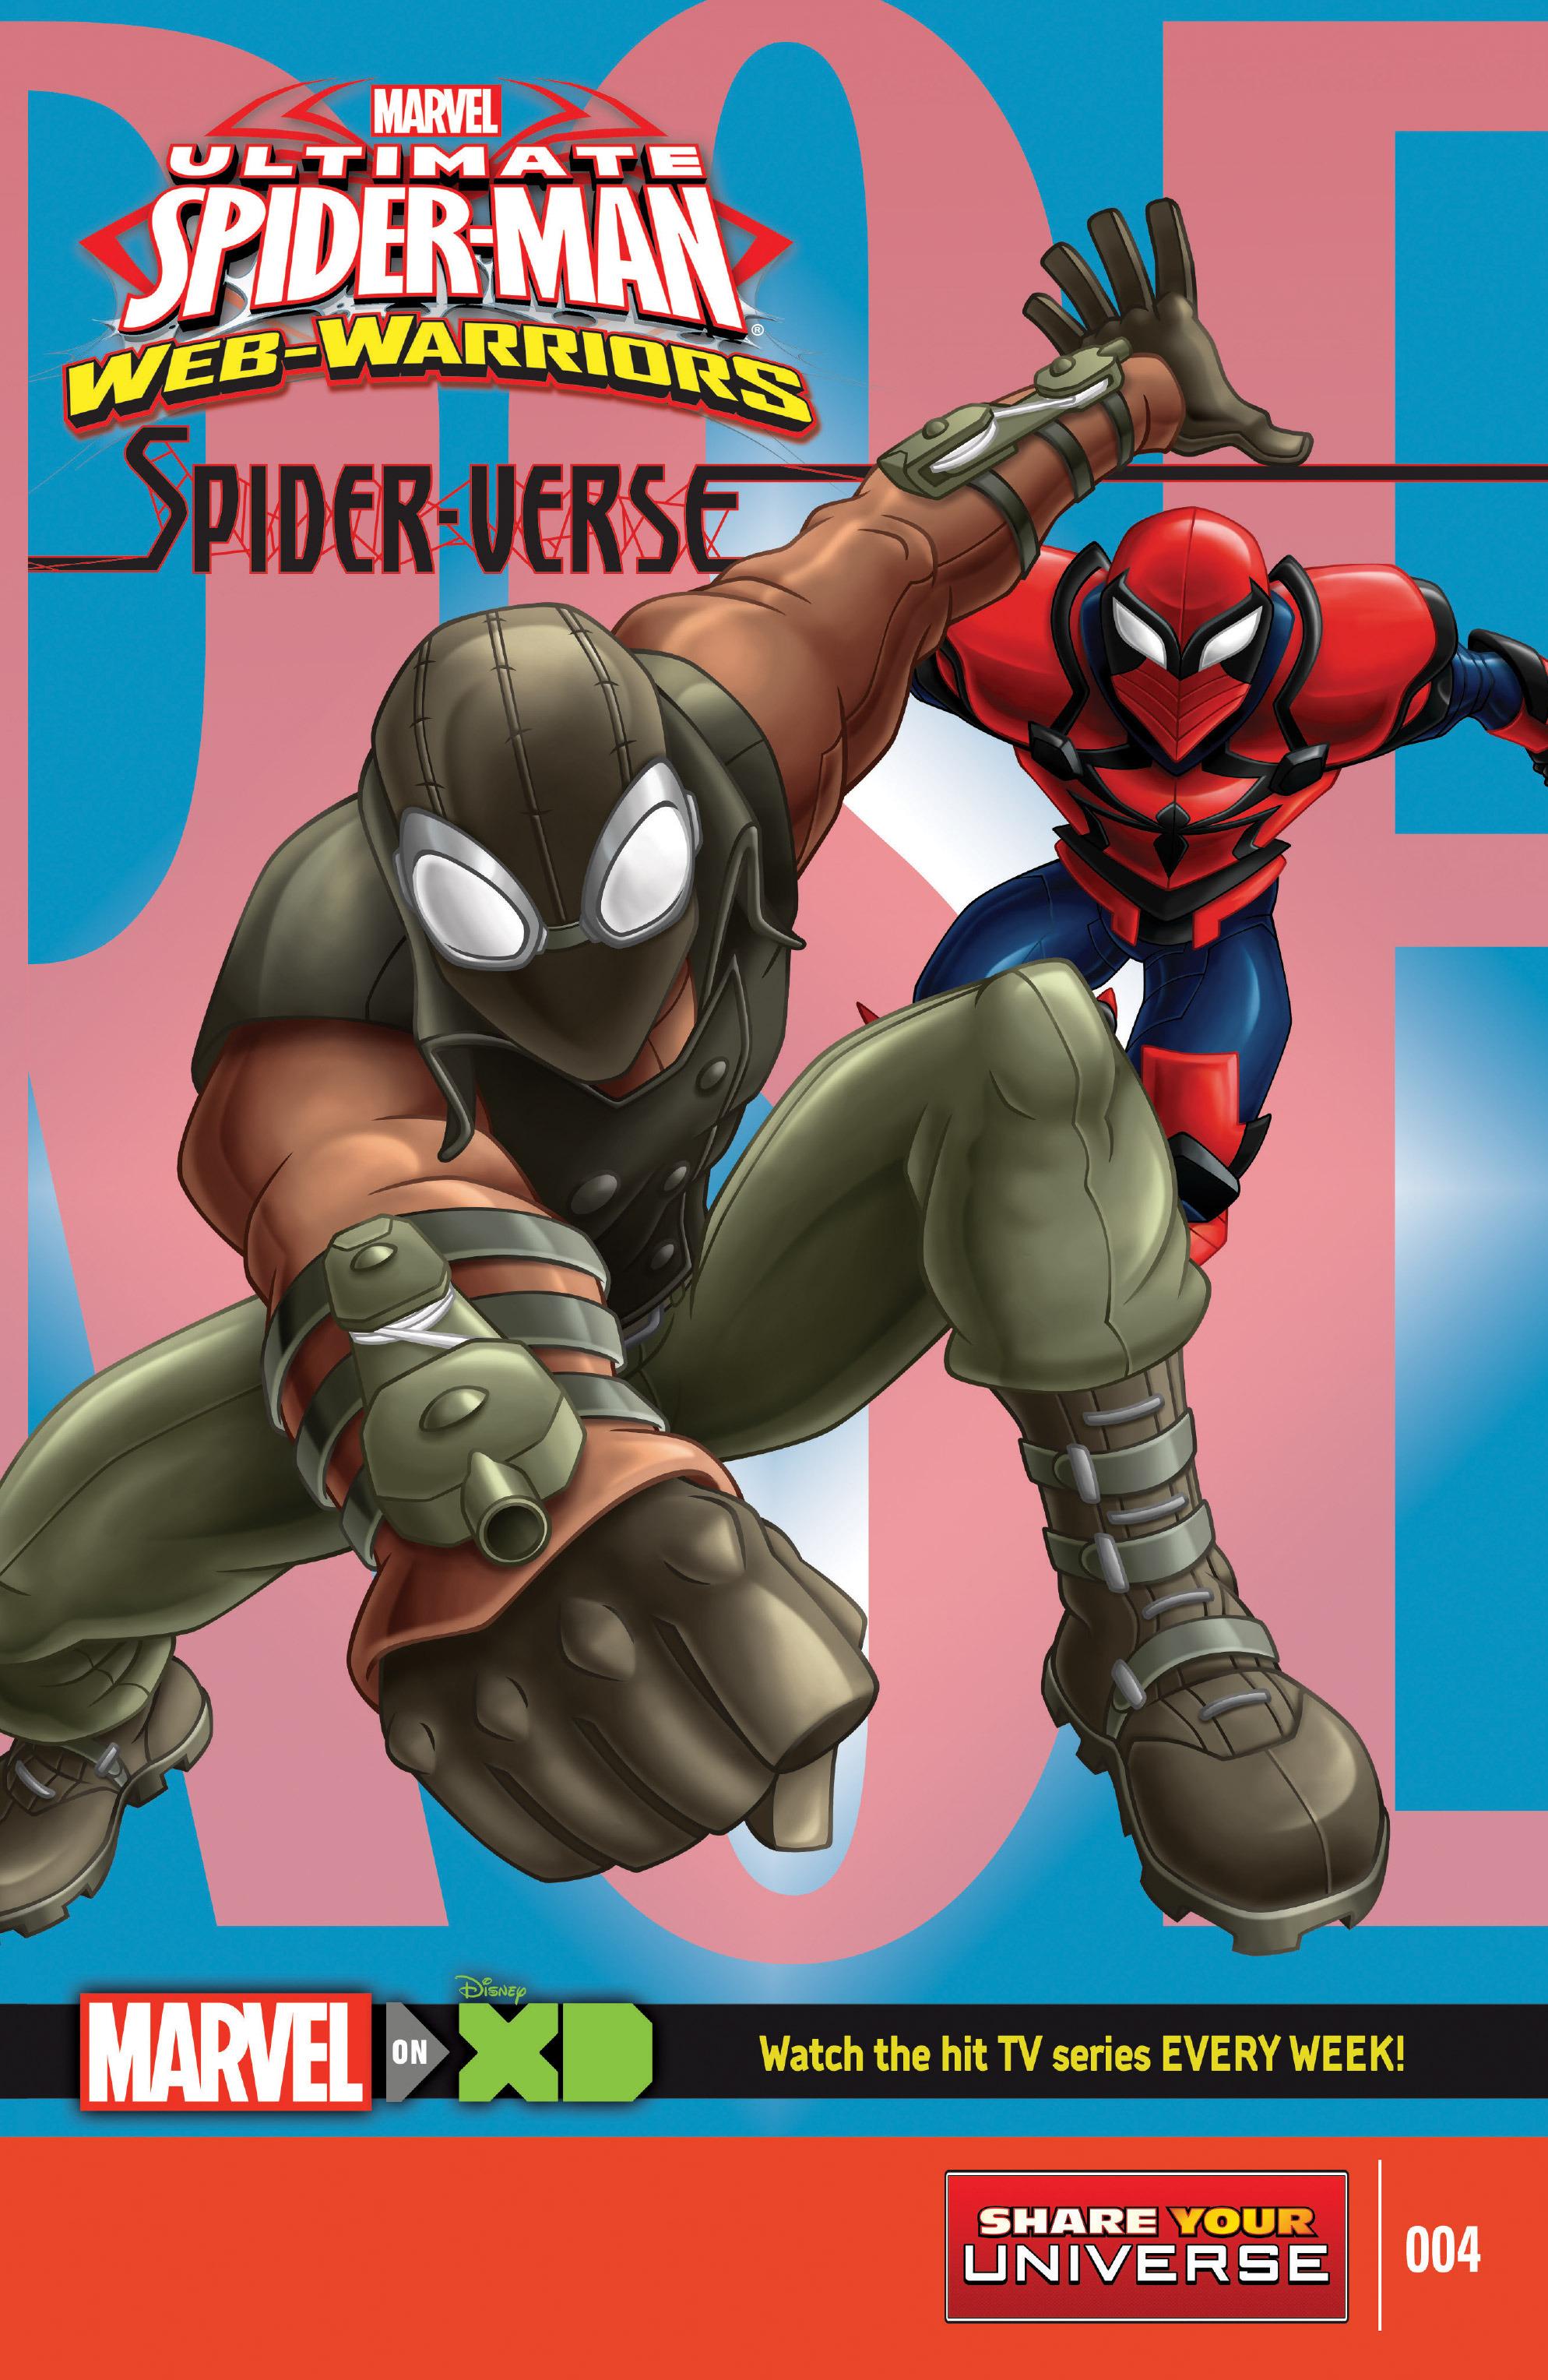 Marvel Universe: Ultimate Spider-Man: Web-Warriors - Spider-Verse ...